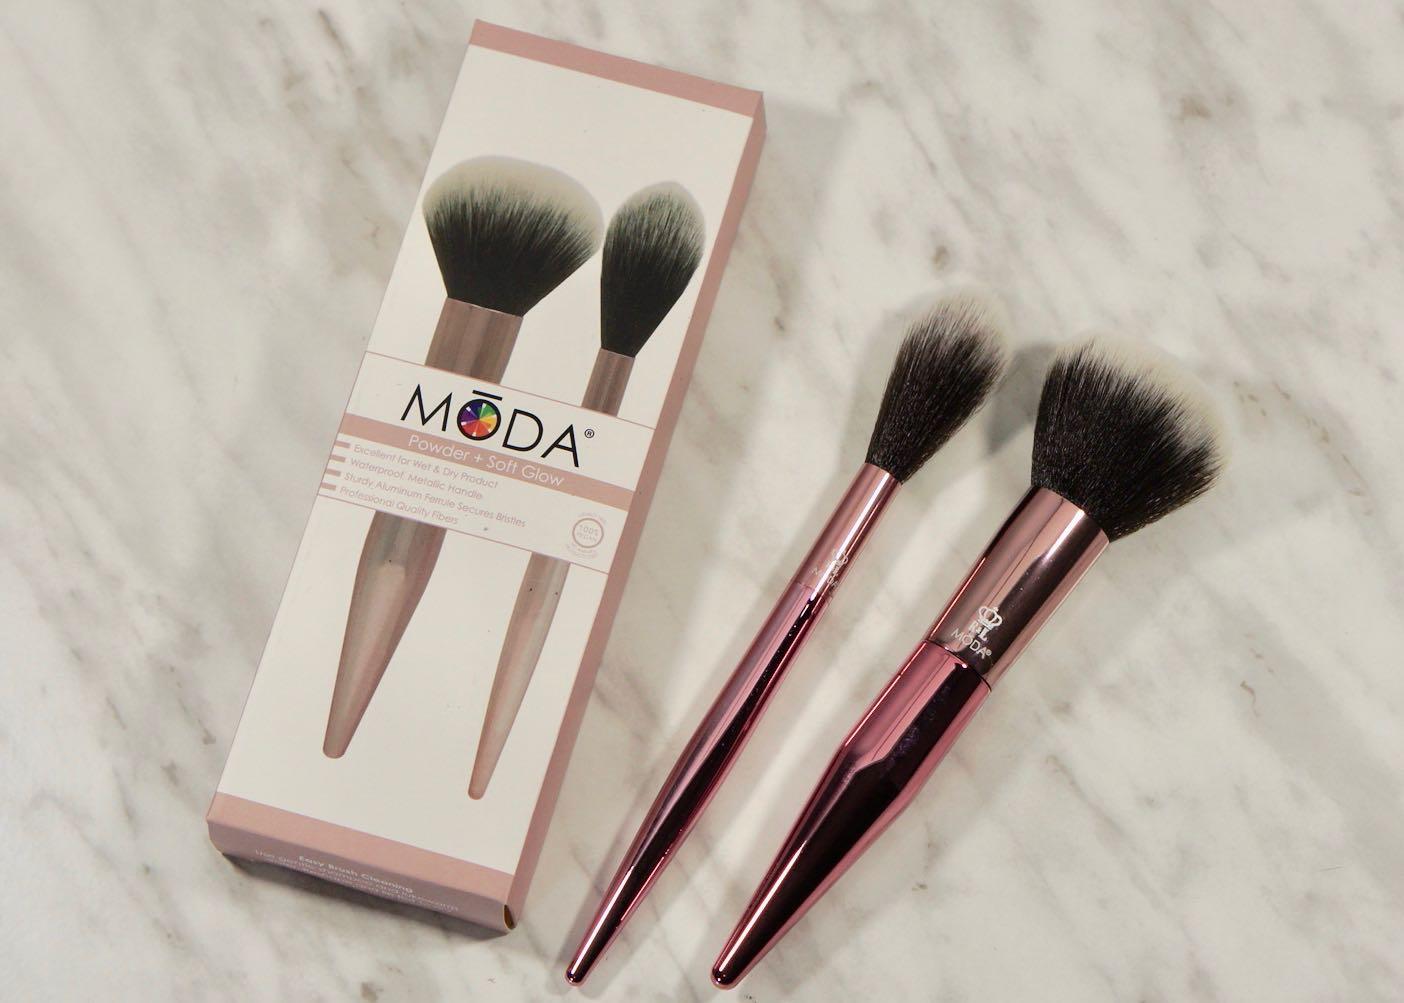 March 2018 Boxyluxe-la vie en rose-Moda Brushes-Powder and Soft Glow KitMarch 2018 Boxyluxe-la vie en roseDSC00704.jpg